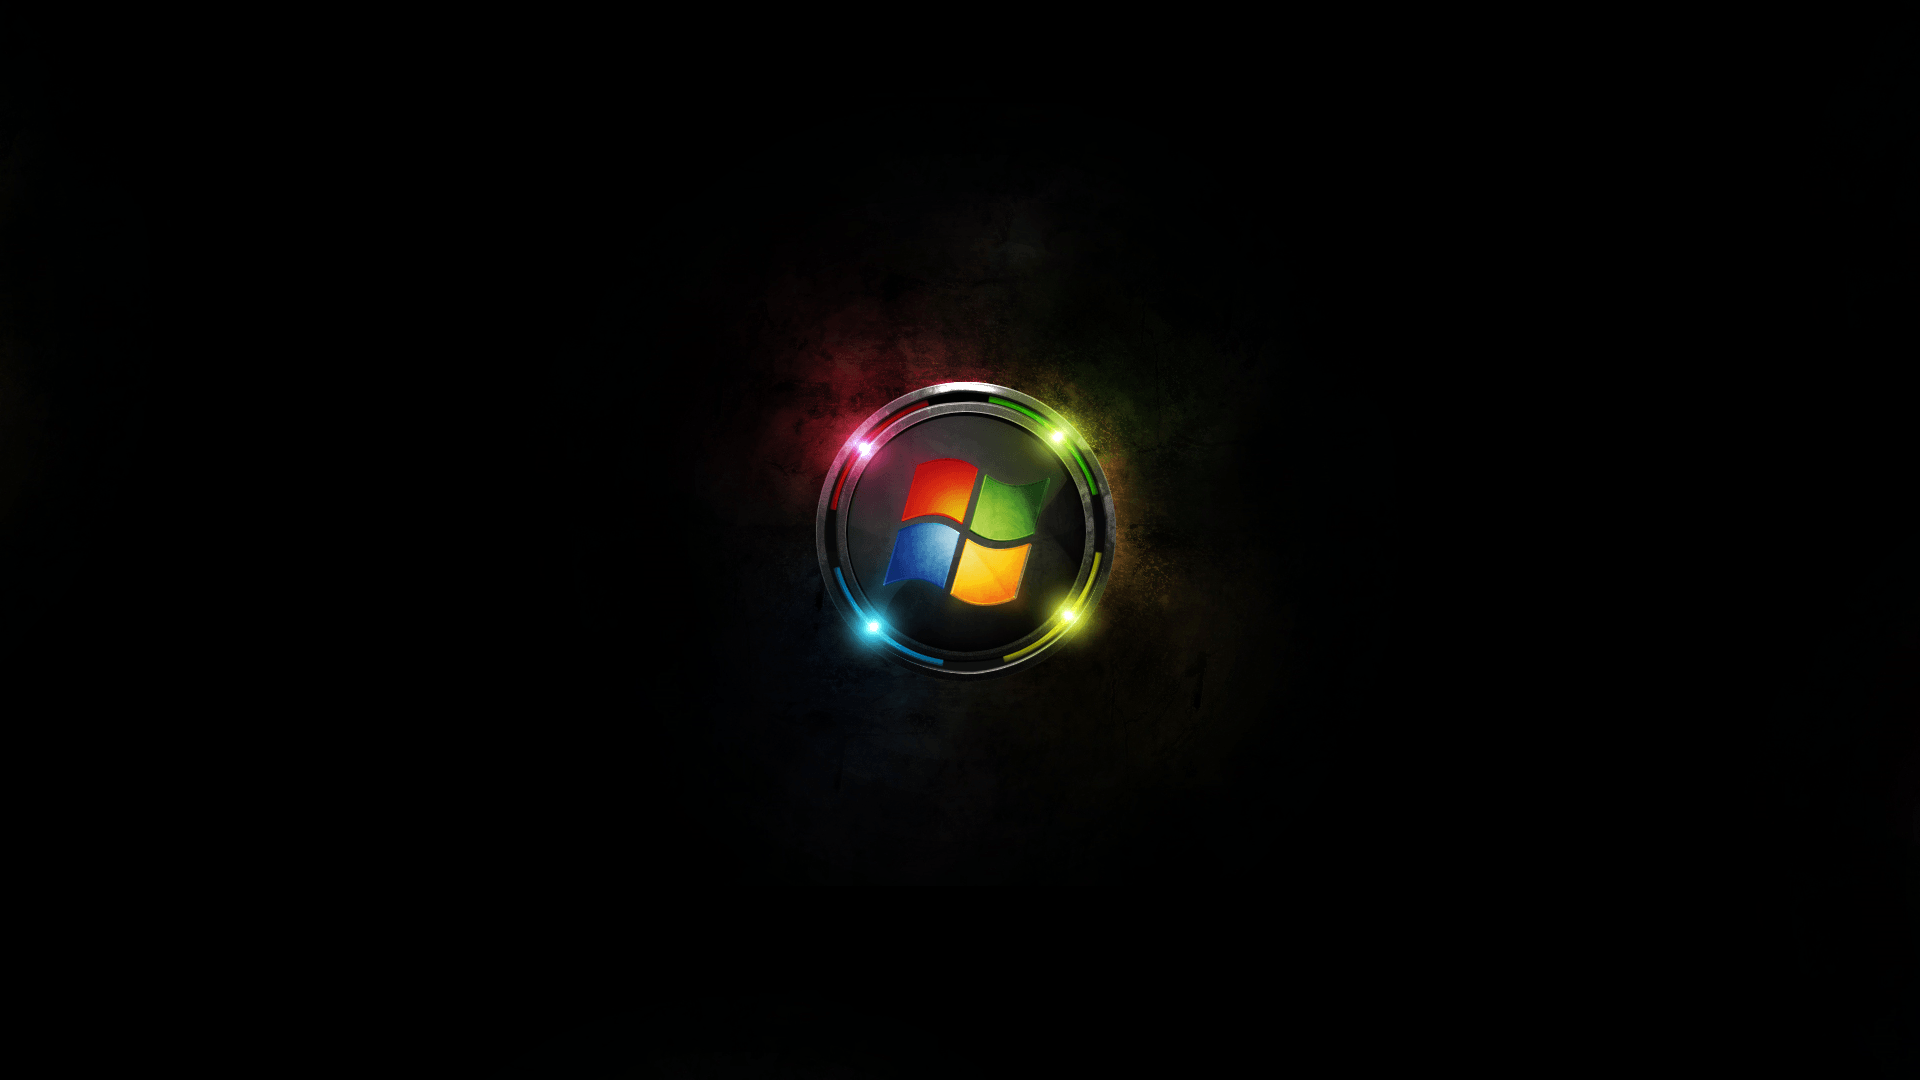 Epic Desktop Backgrounds HD  Wallpaper Cave